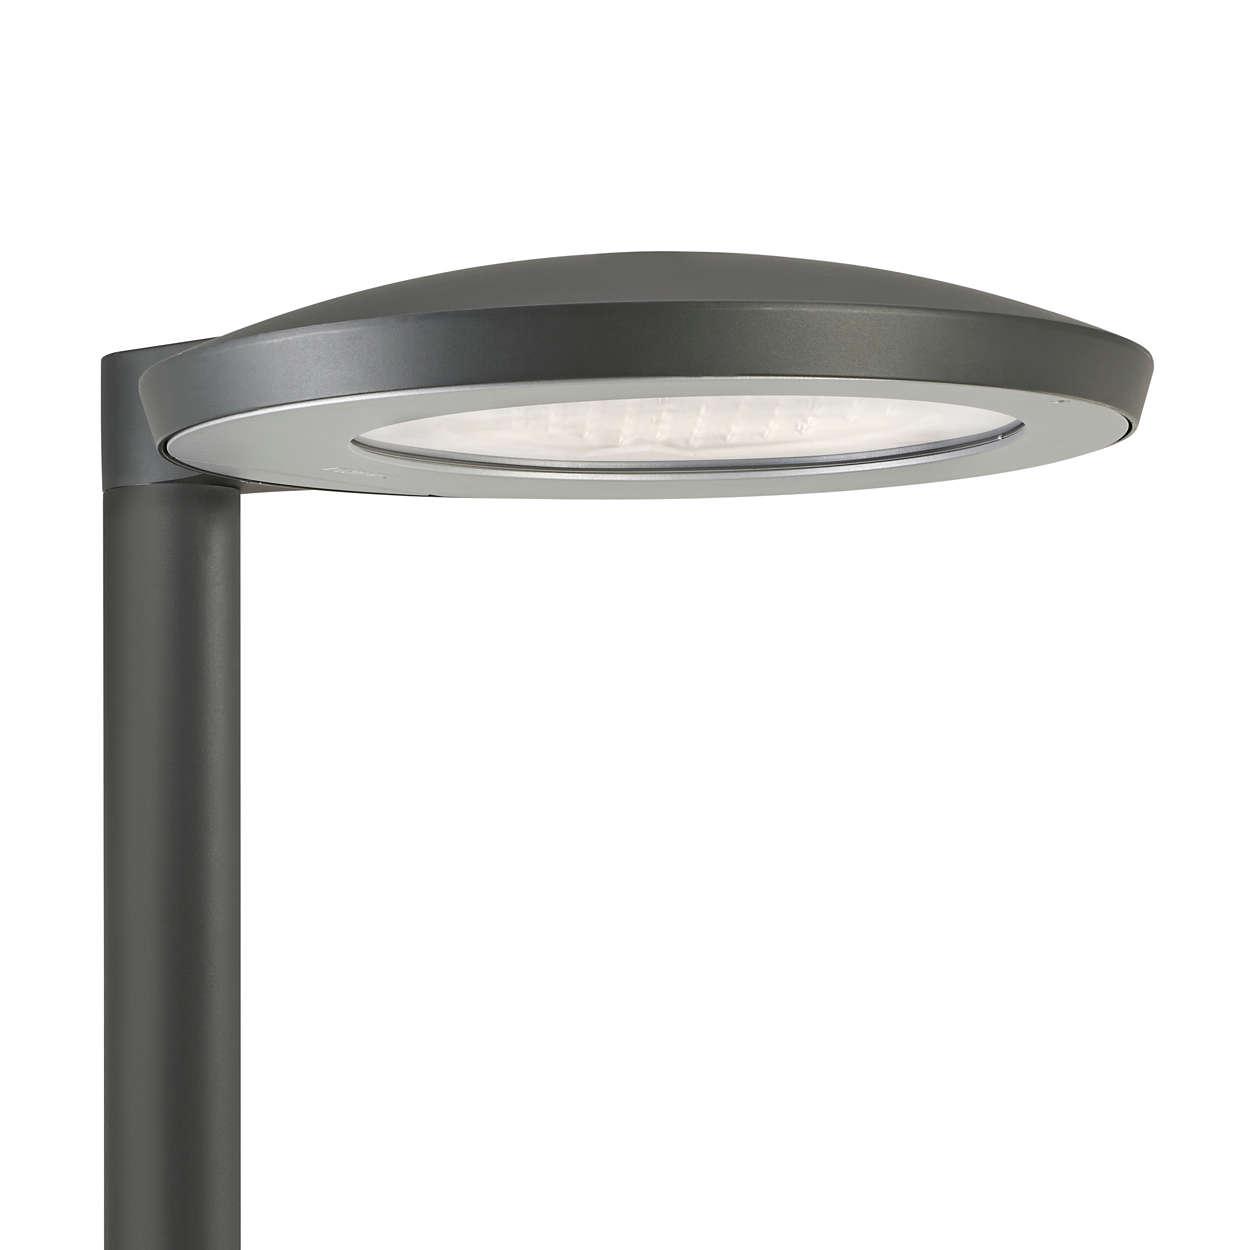 CitySoul gen2 LED — uniwersalny wybór